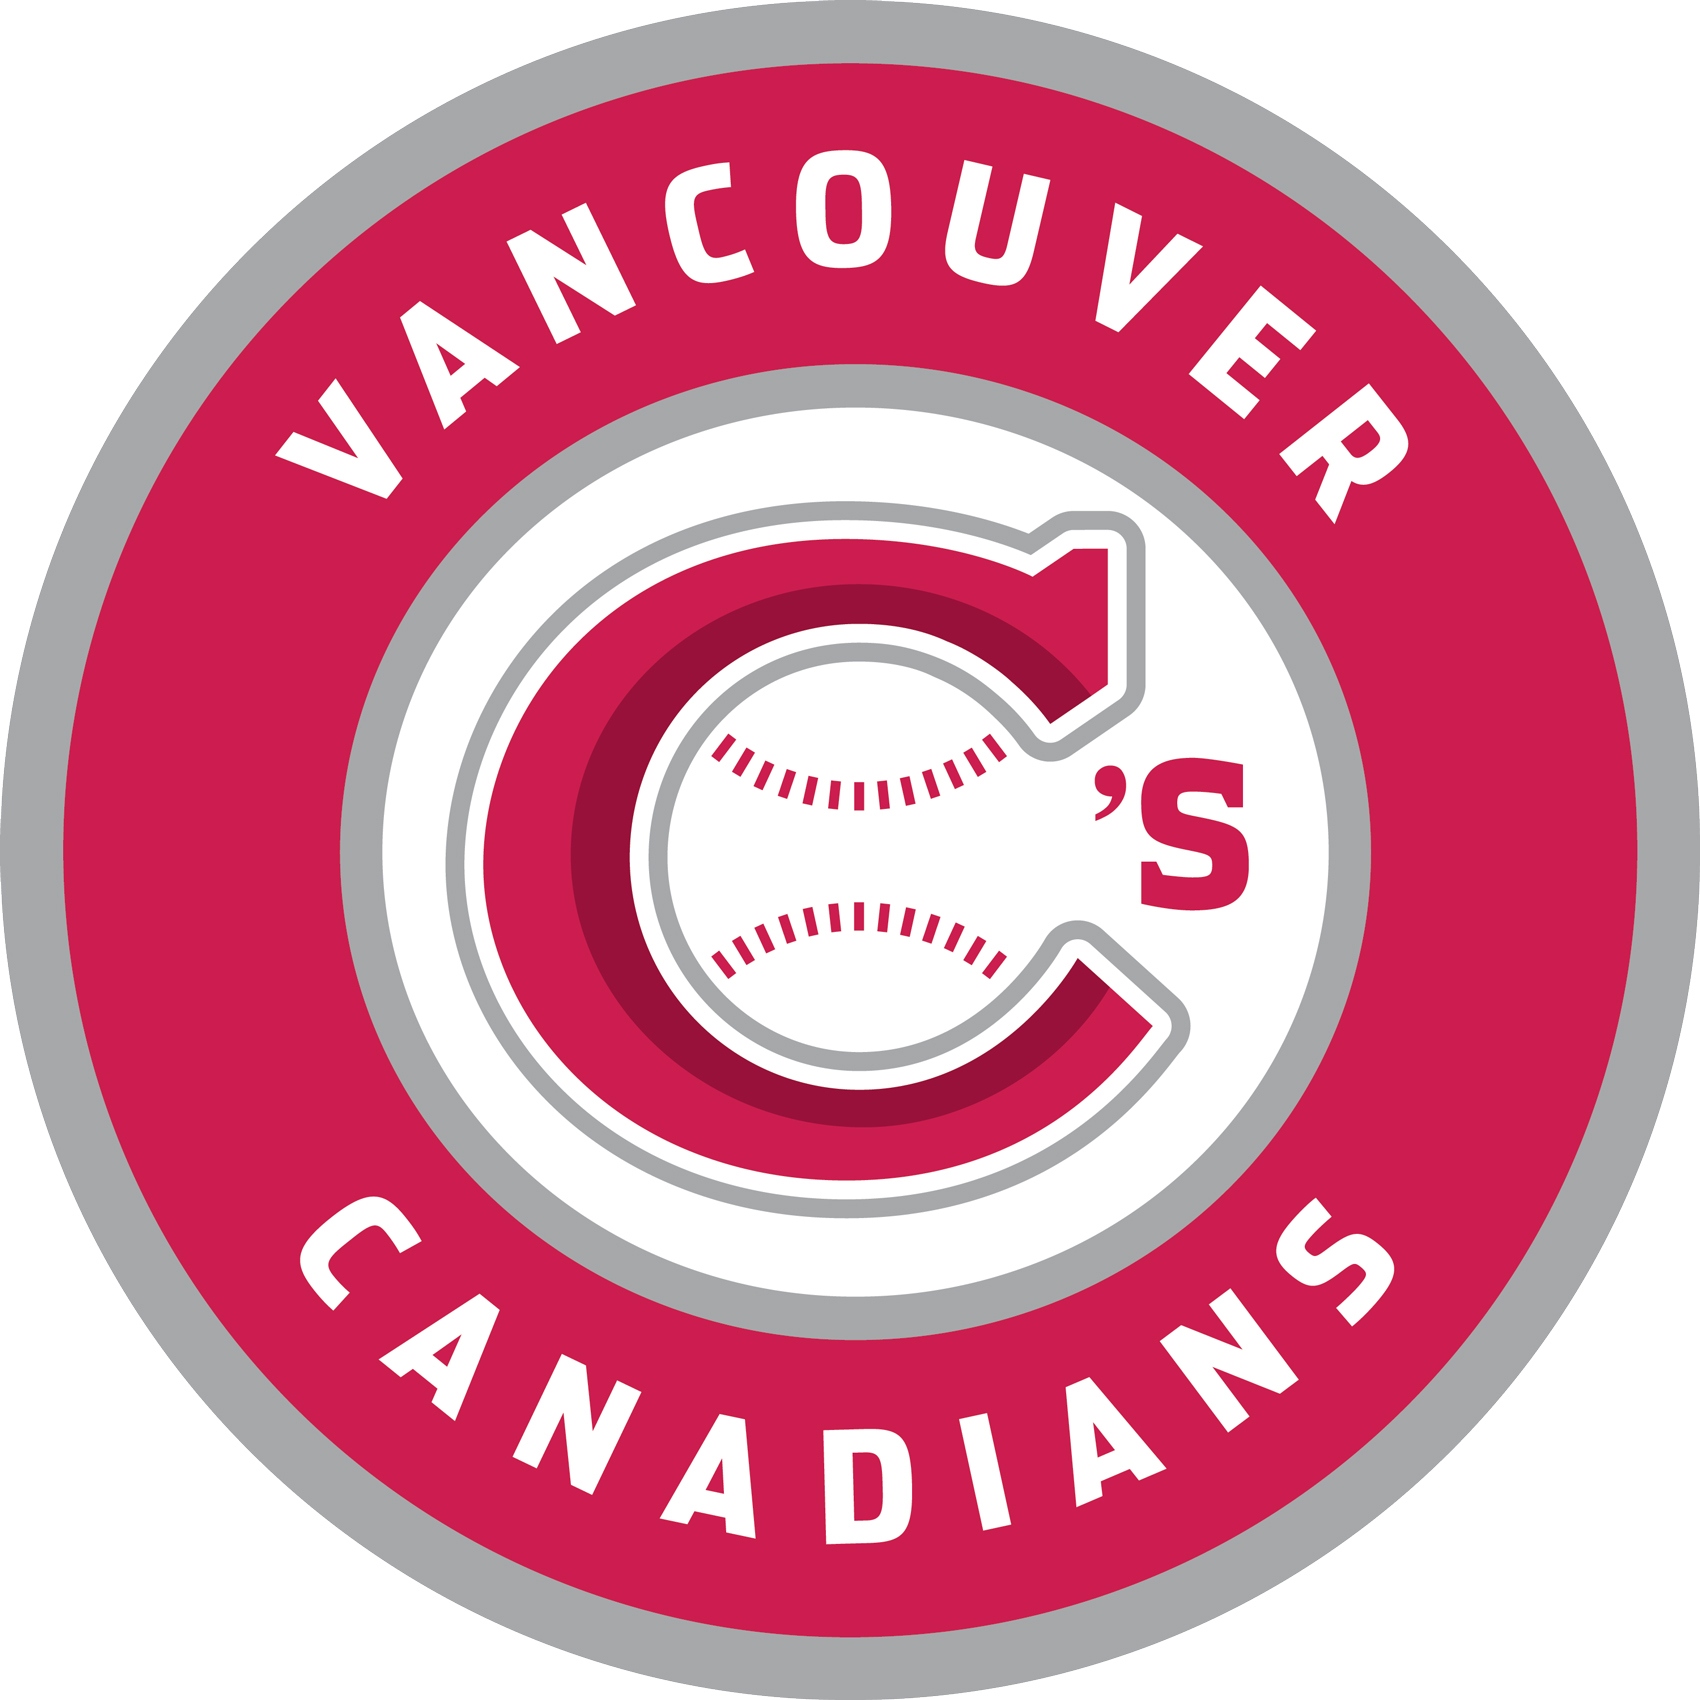 Vancouver Canadians Outlast Hillsboro Hops, 5-3